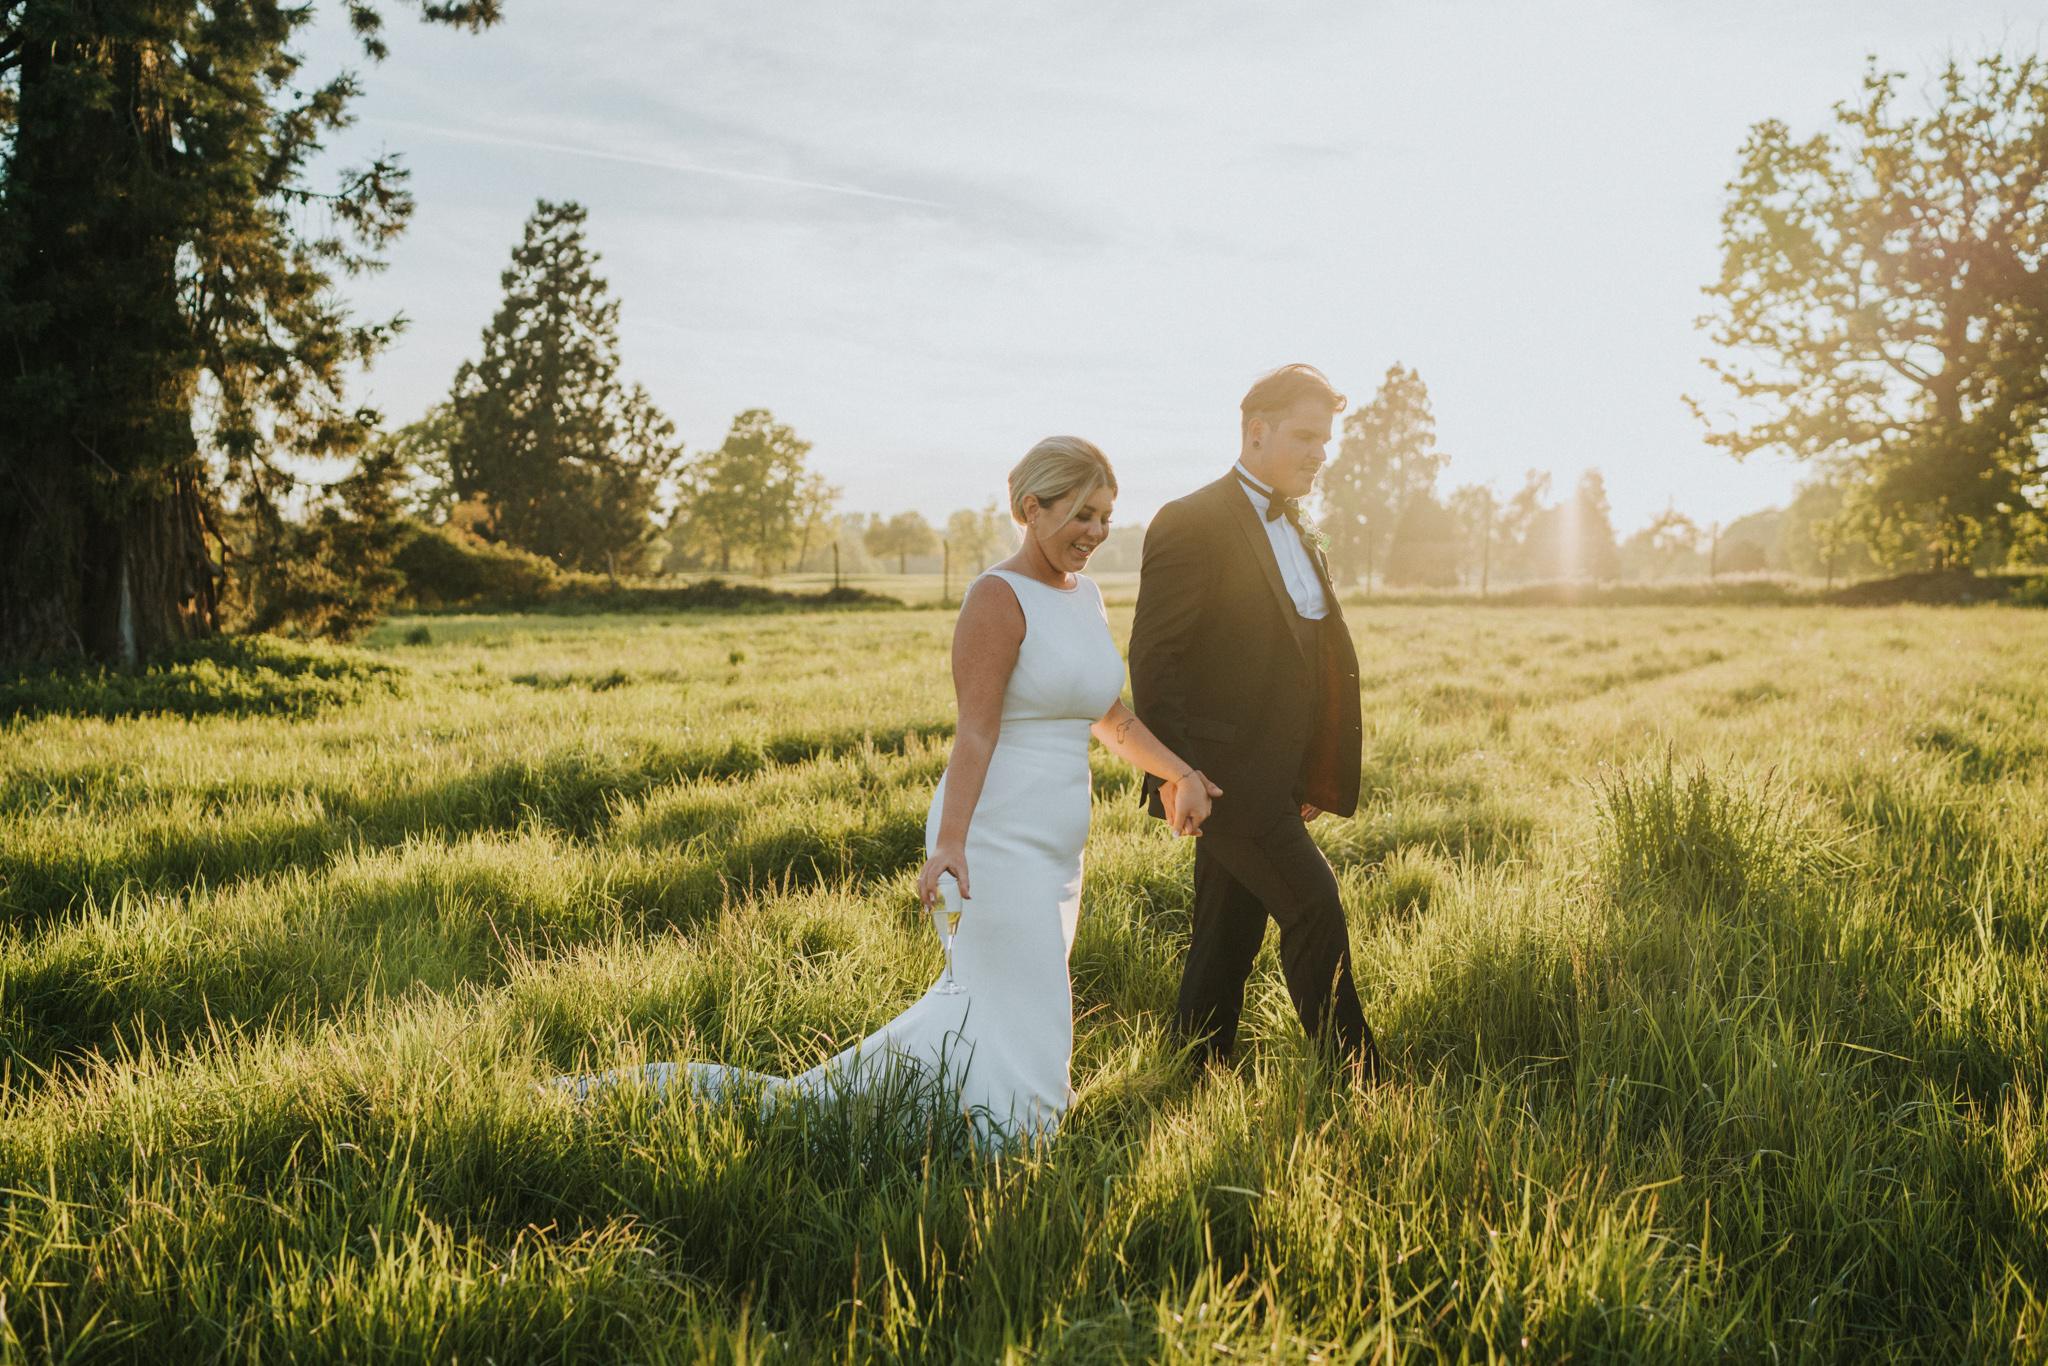 chloe-dan-gosfield-hall-wedding-photographer-grace-elizabeth-colchester-essex-alternative-wedding-photographer-suffolk-norfolk-devon (39 of 41).jpg